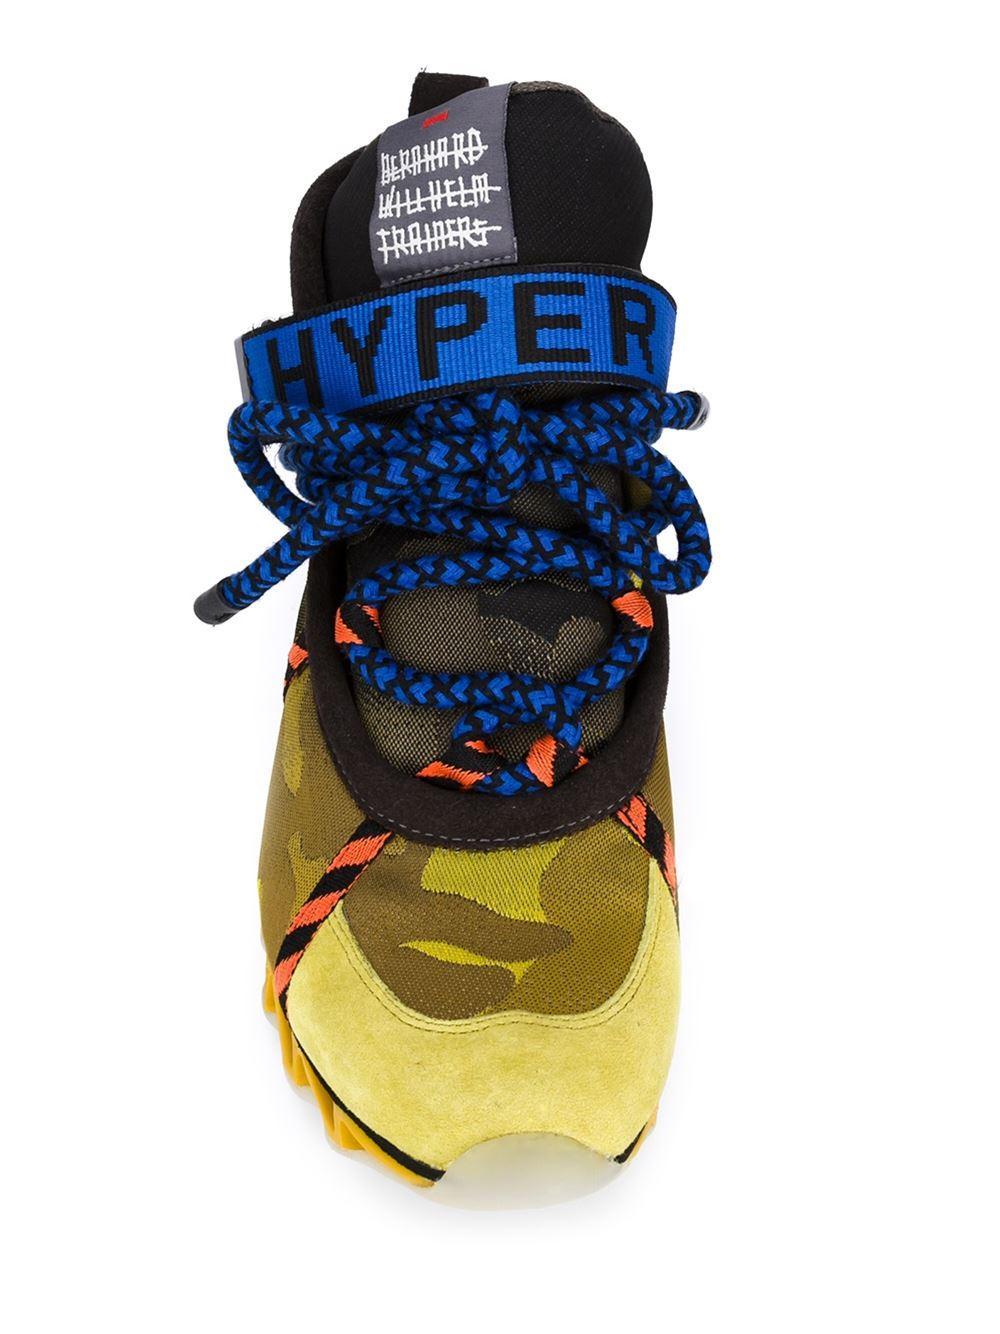 Bernhard Willhelm Cotton X Camper 'himalayan' Sneakers